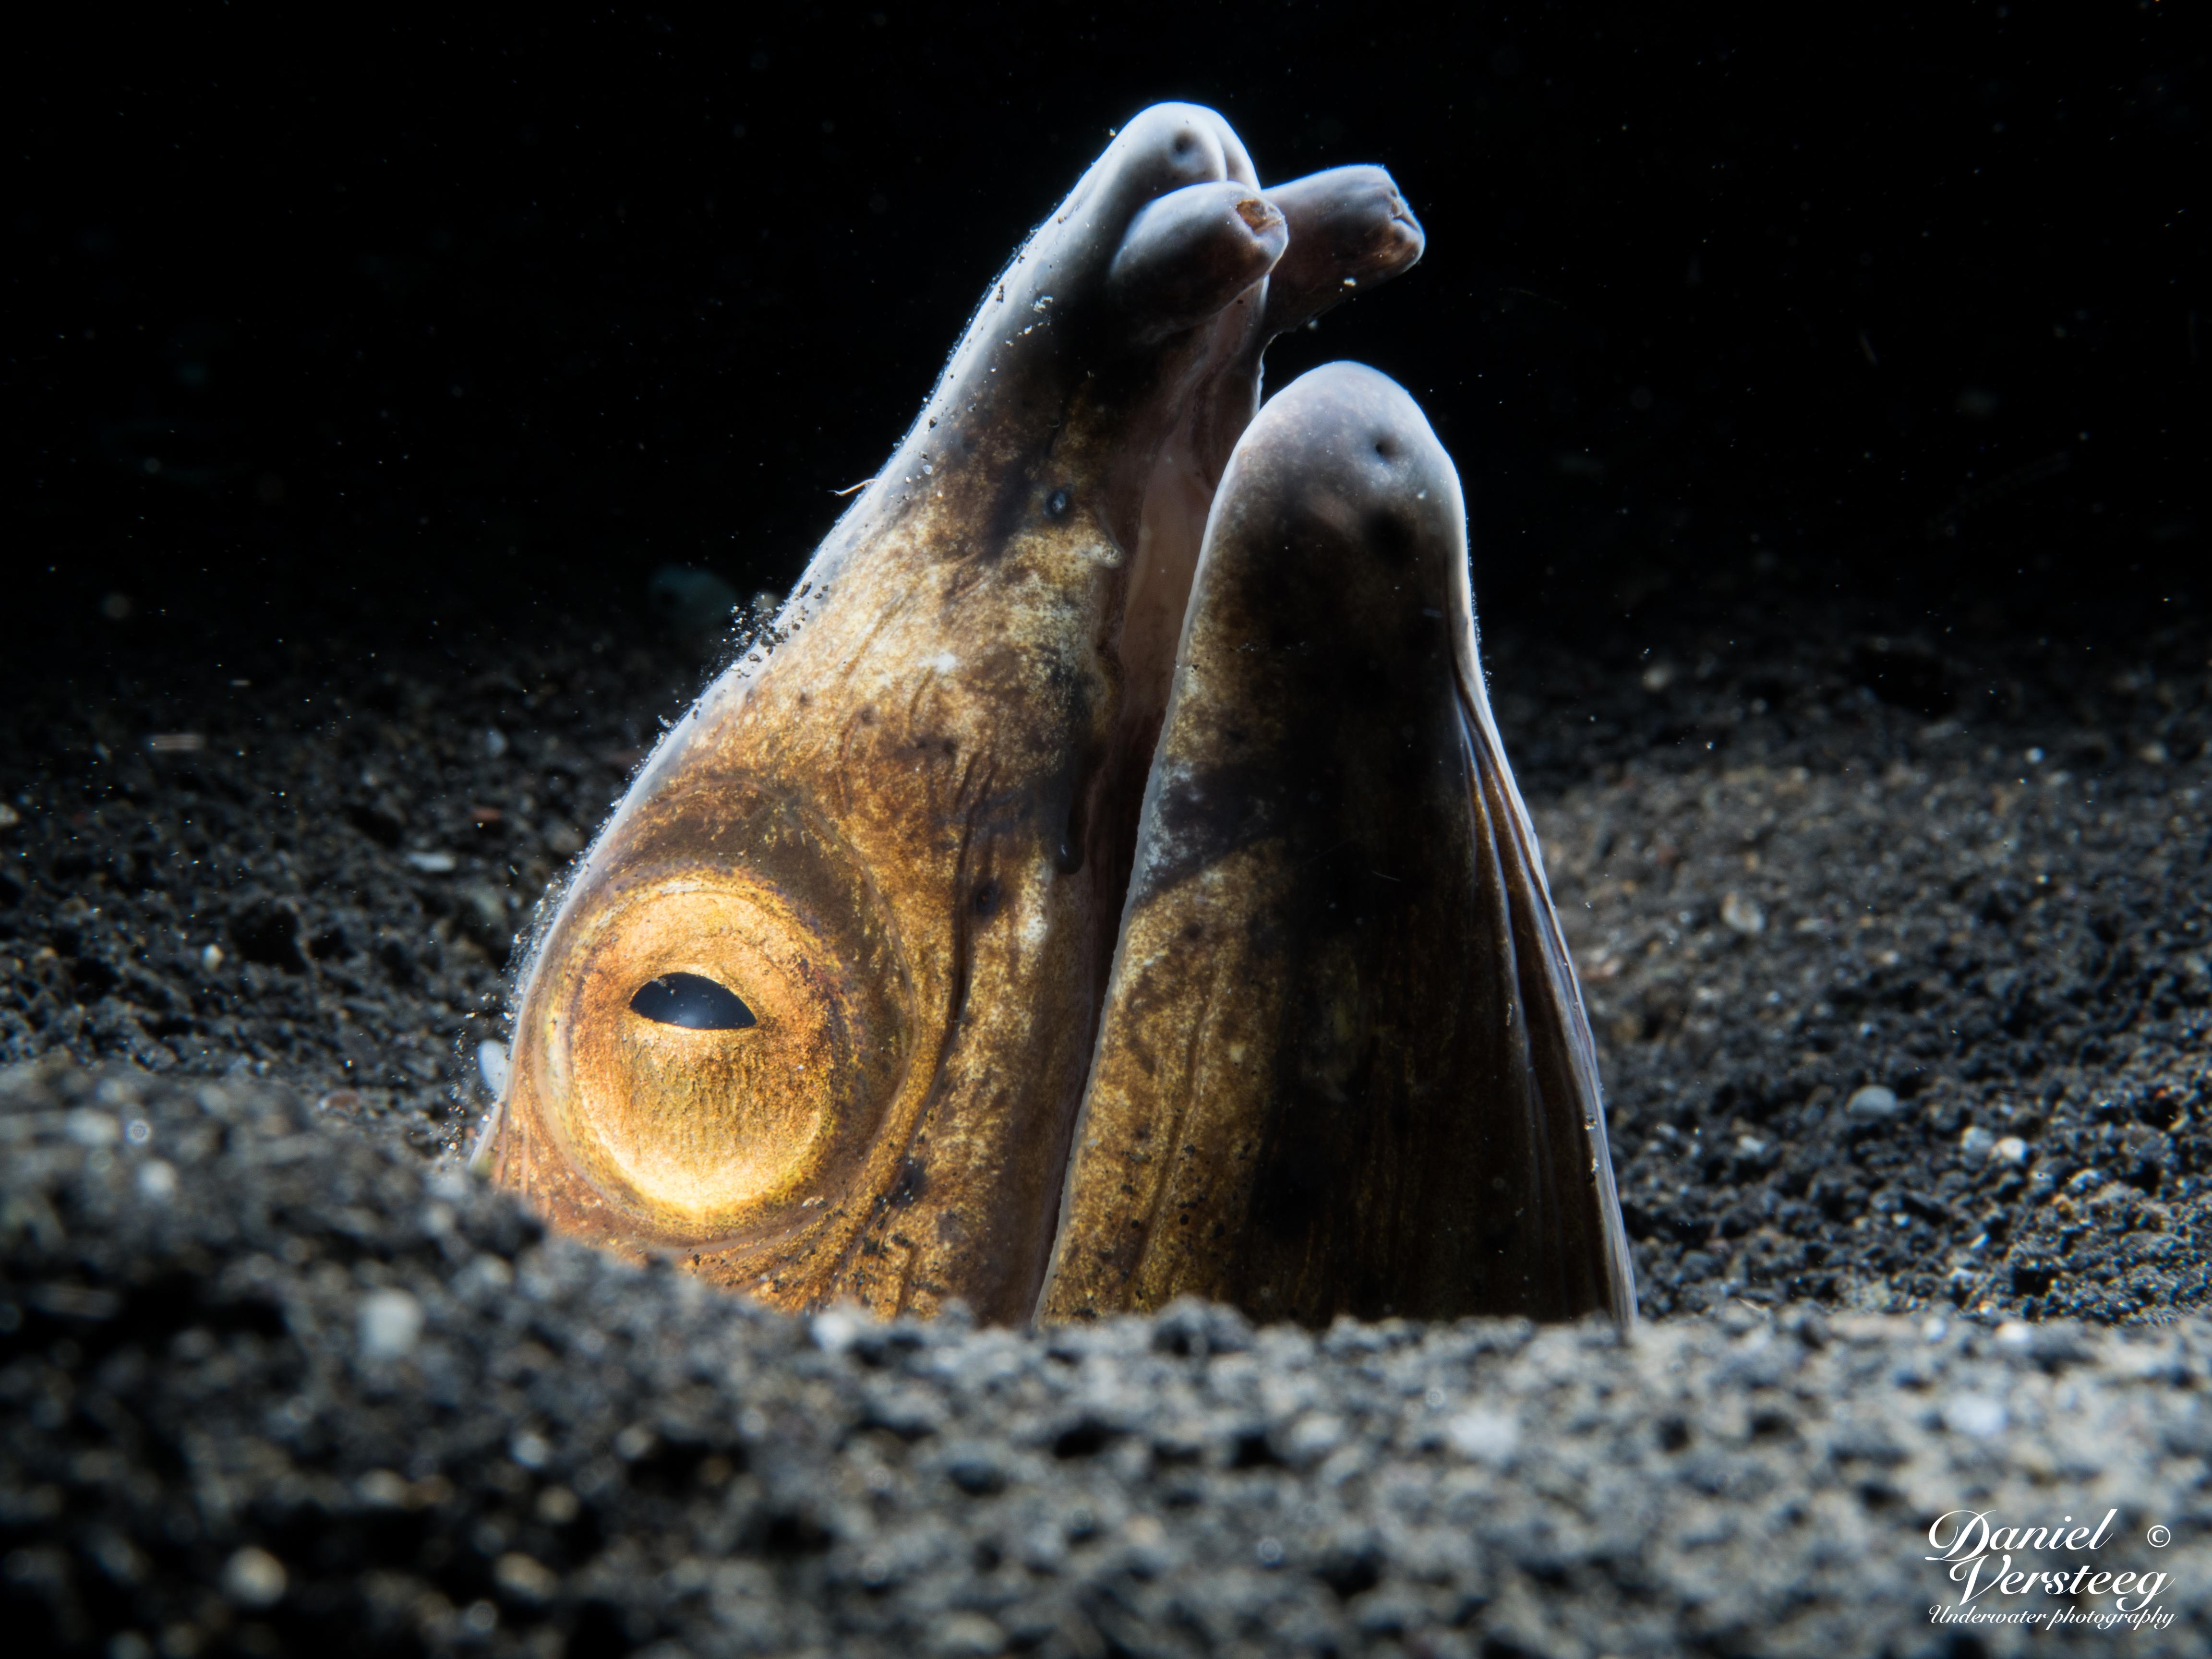 Daniel_Versteeg_foto-4-snake-eel-met-lsd-snoot-1